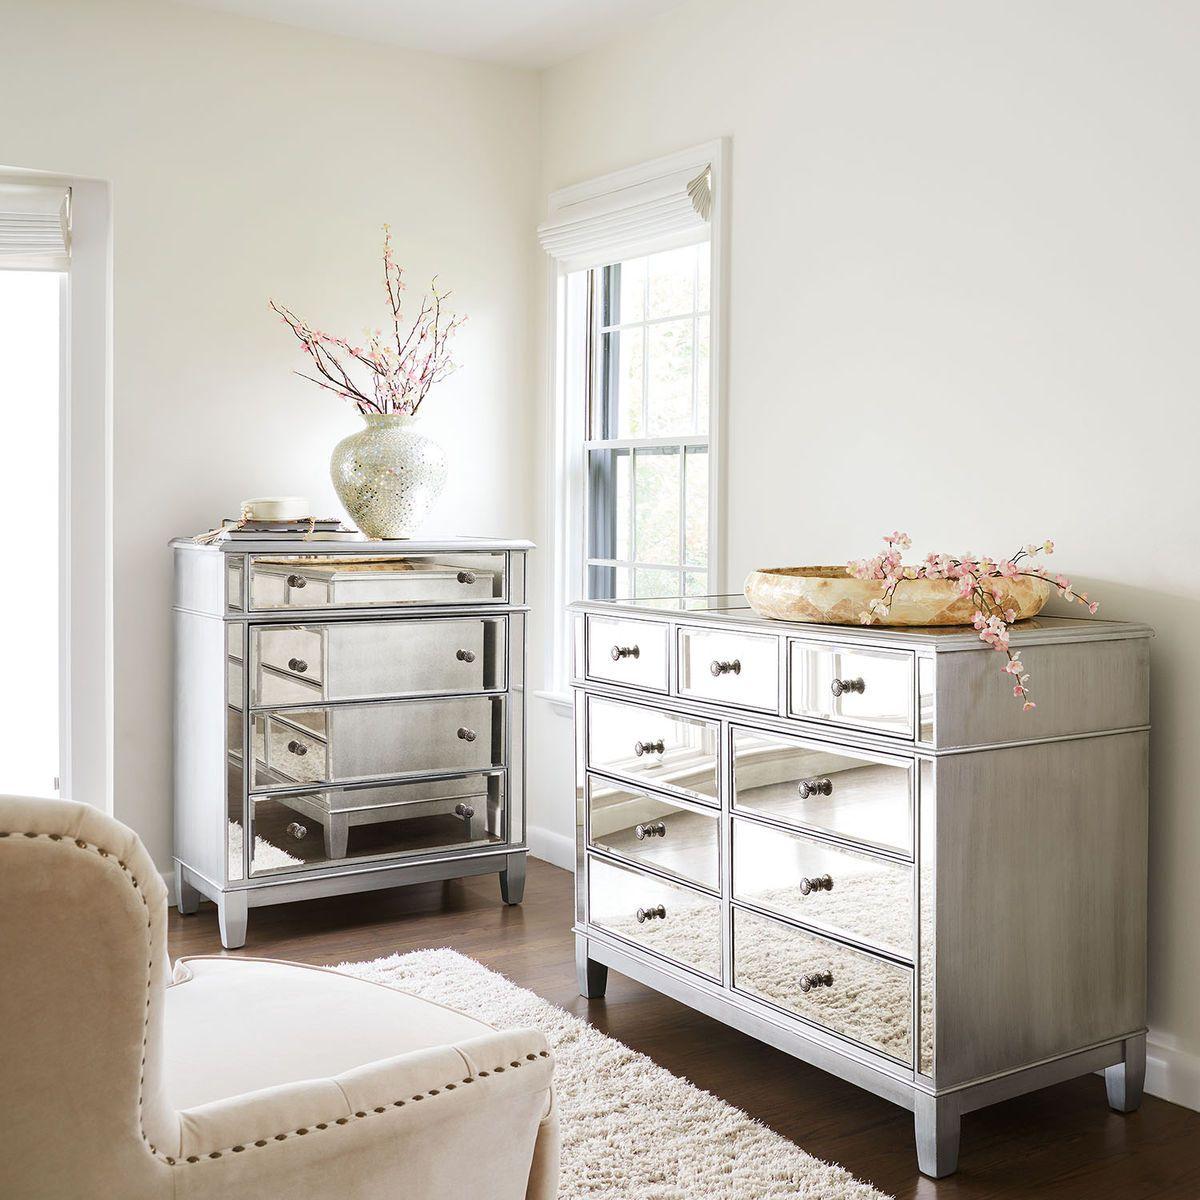 Hayworth Mirrored Silver Chest Dresser Bedroom Set Pier 1 Imports Mirrored Bedroom Furniture Diy Furniture Bedroom Mirrored Furniture